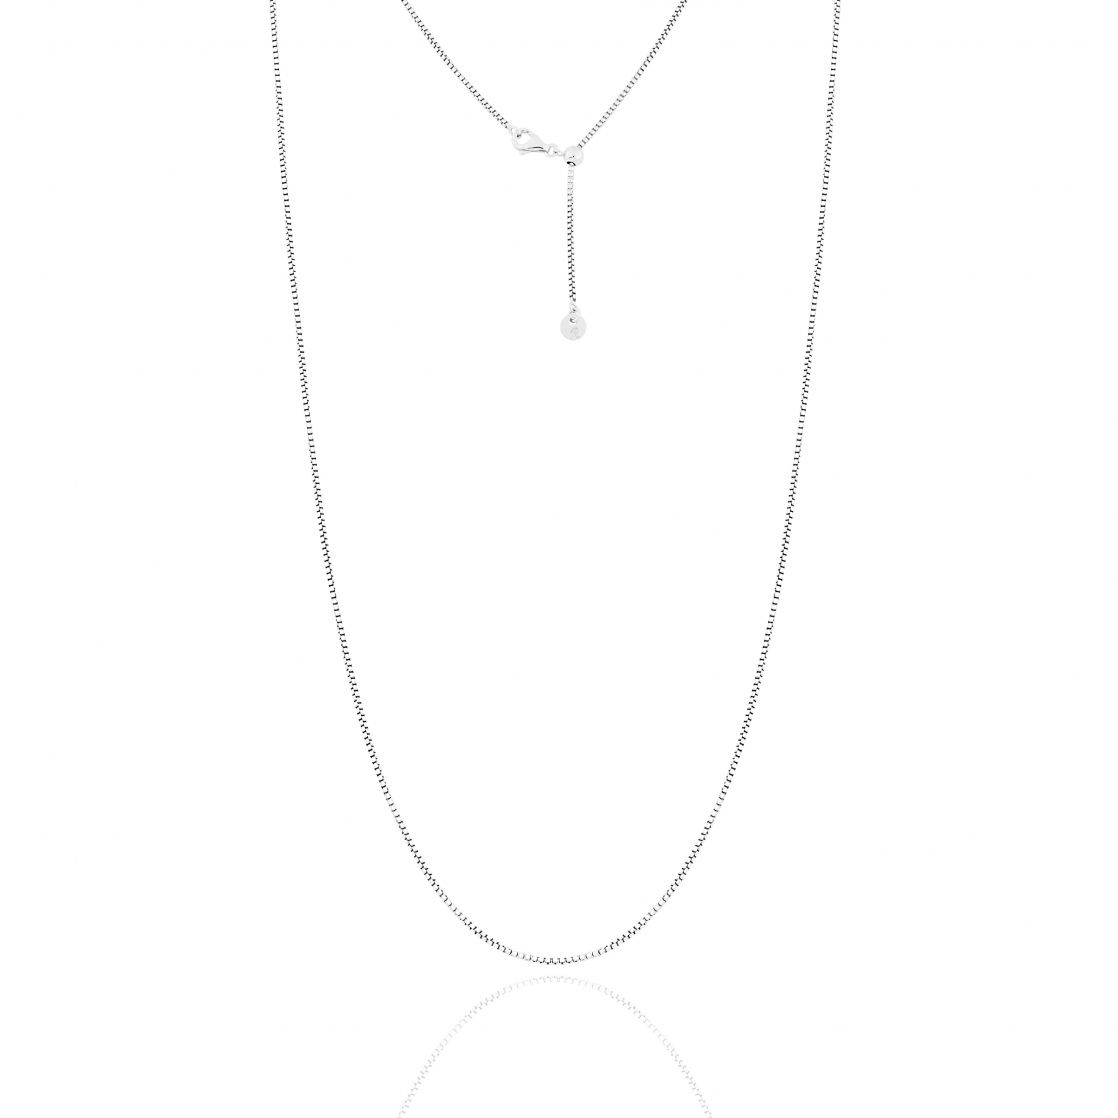 Collana veneziana con sliding